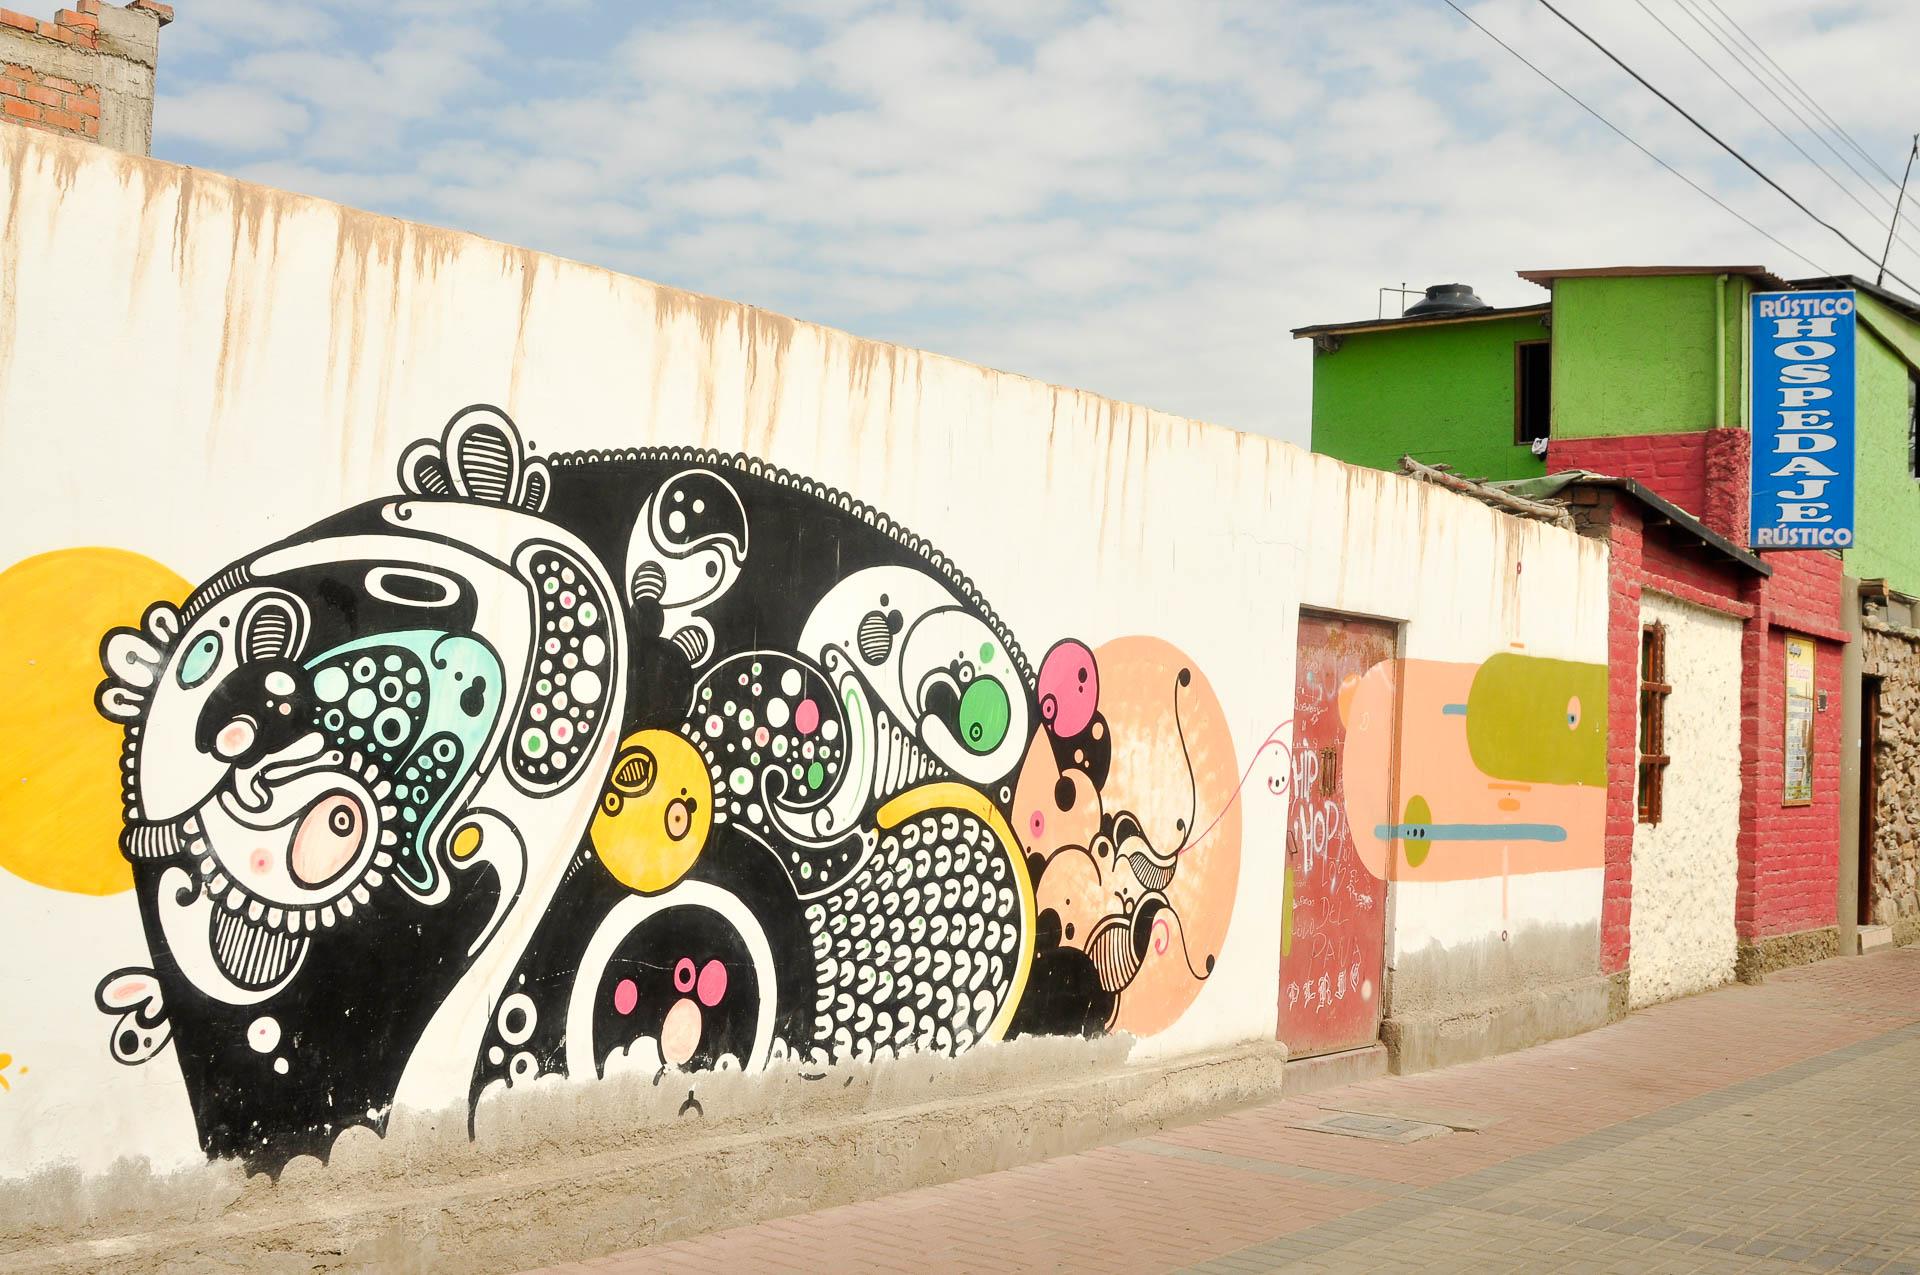 Huanchaco graff hospedaje - Les globe blogueurs - blog voyage nature